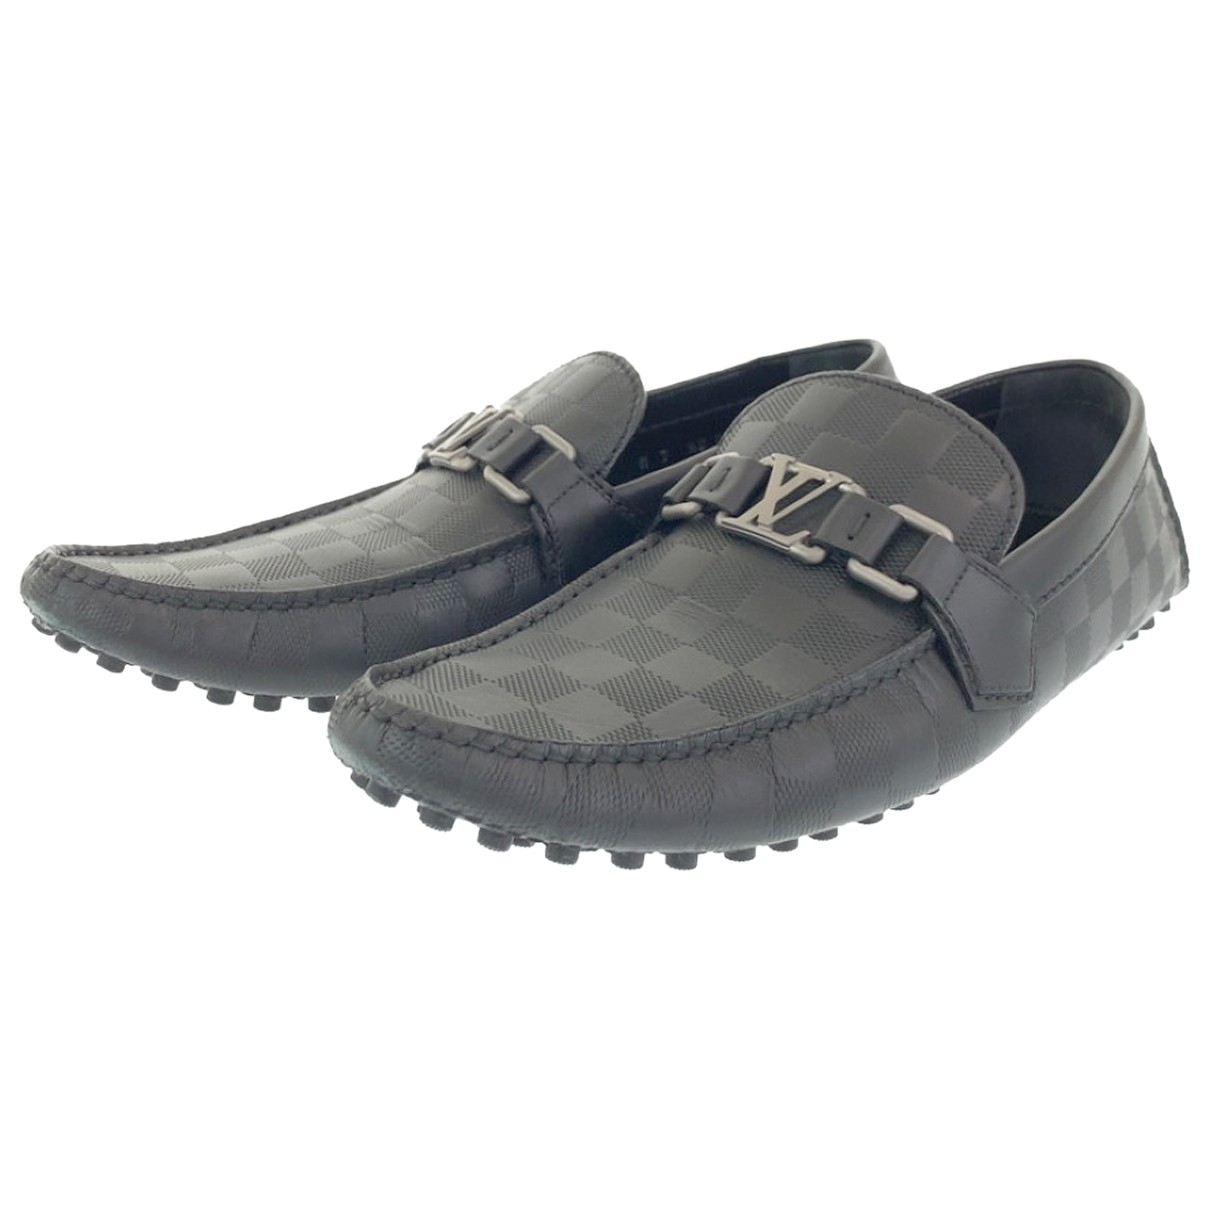 Louis Vuitton N Leather Flats for Men 7 US